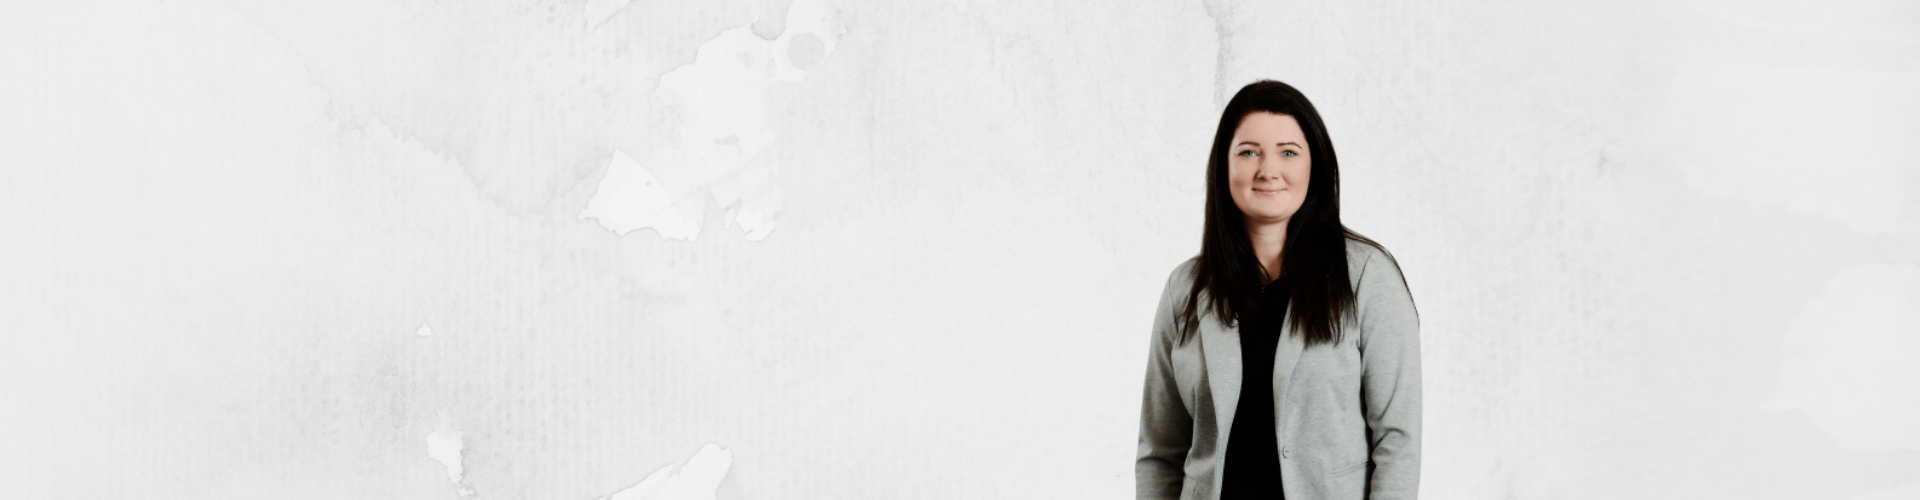 Janni Kjaergaard Floor - revisorassistent